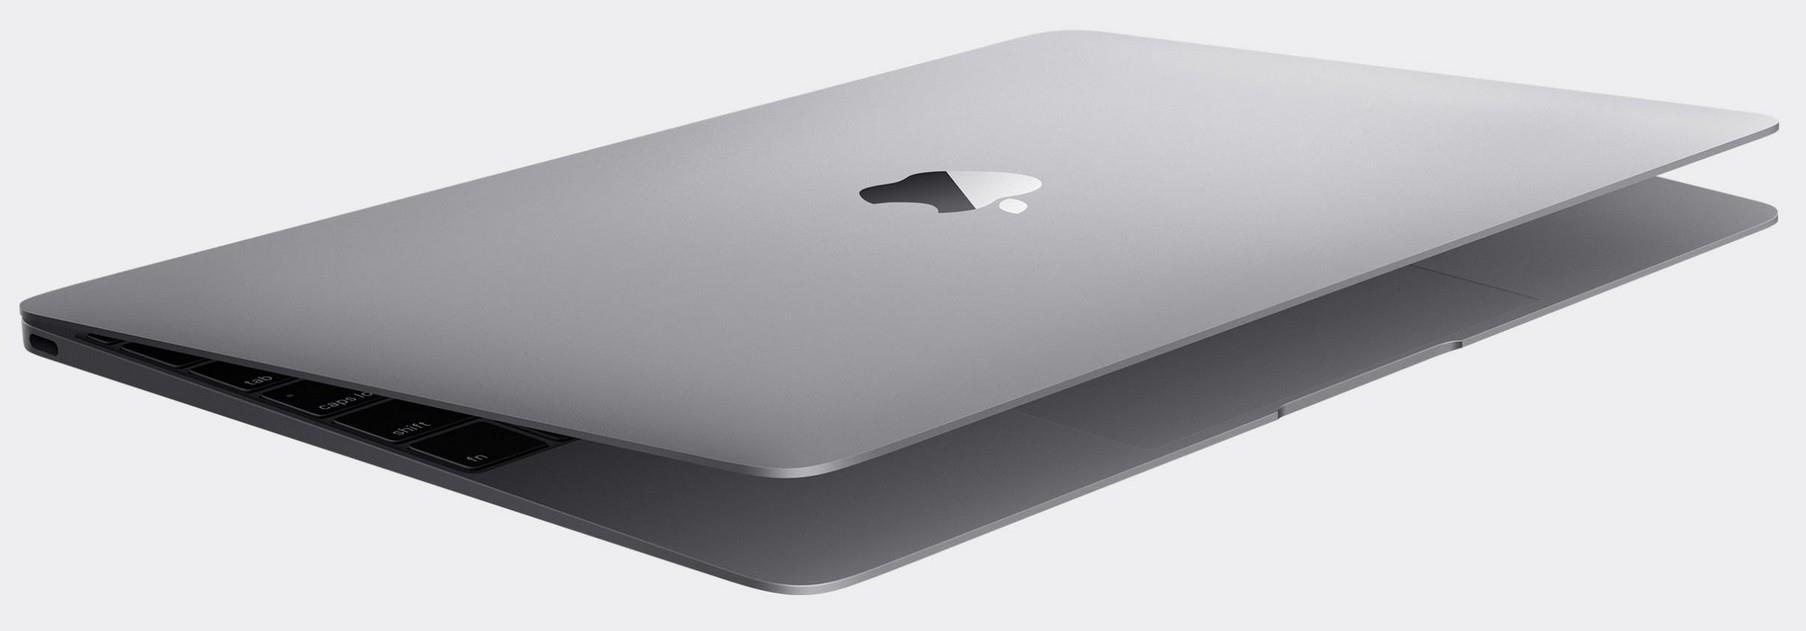 apple macbook 12 petite mise jour conseils d 39 experts fnac. Black Bedroom Furniture Sets. Home Design Ideas